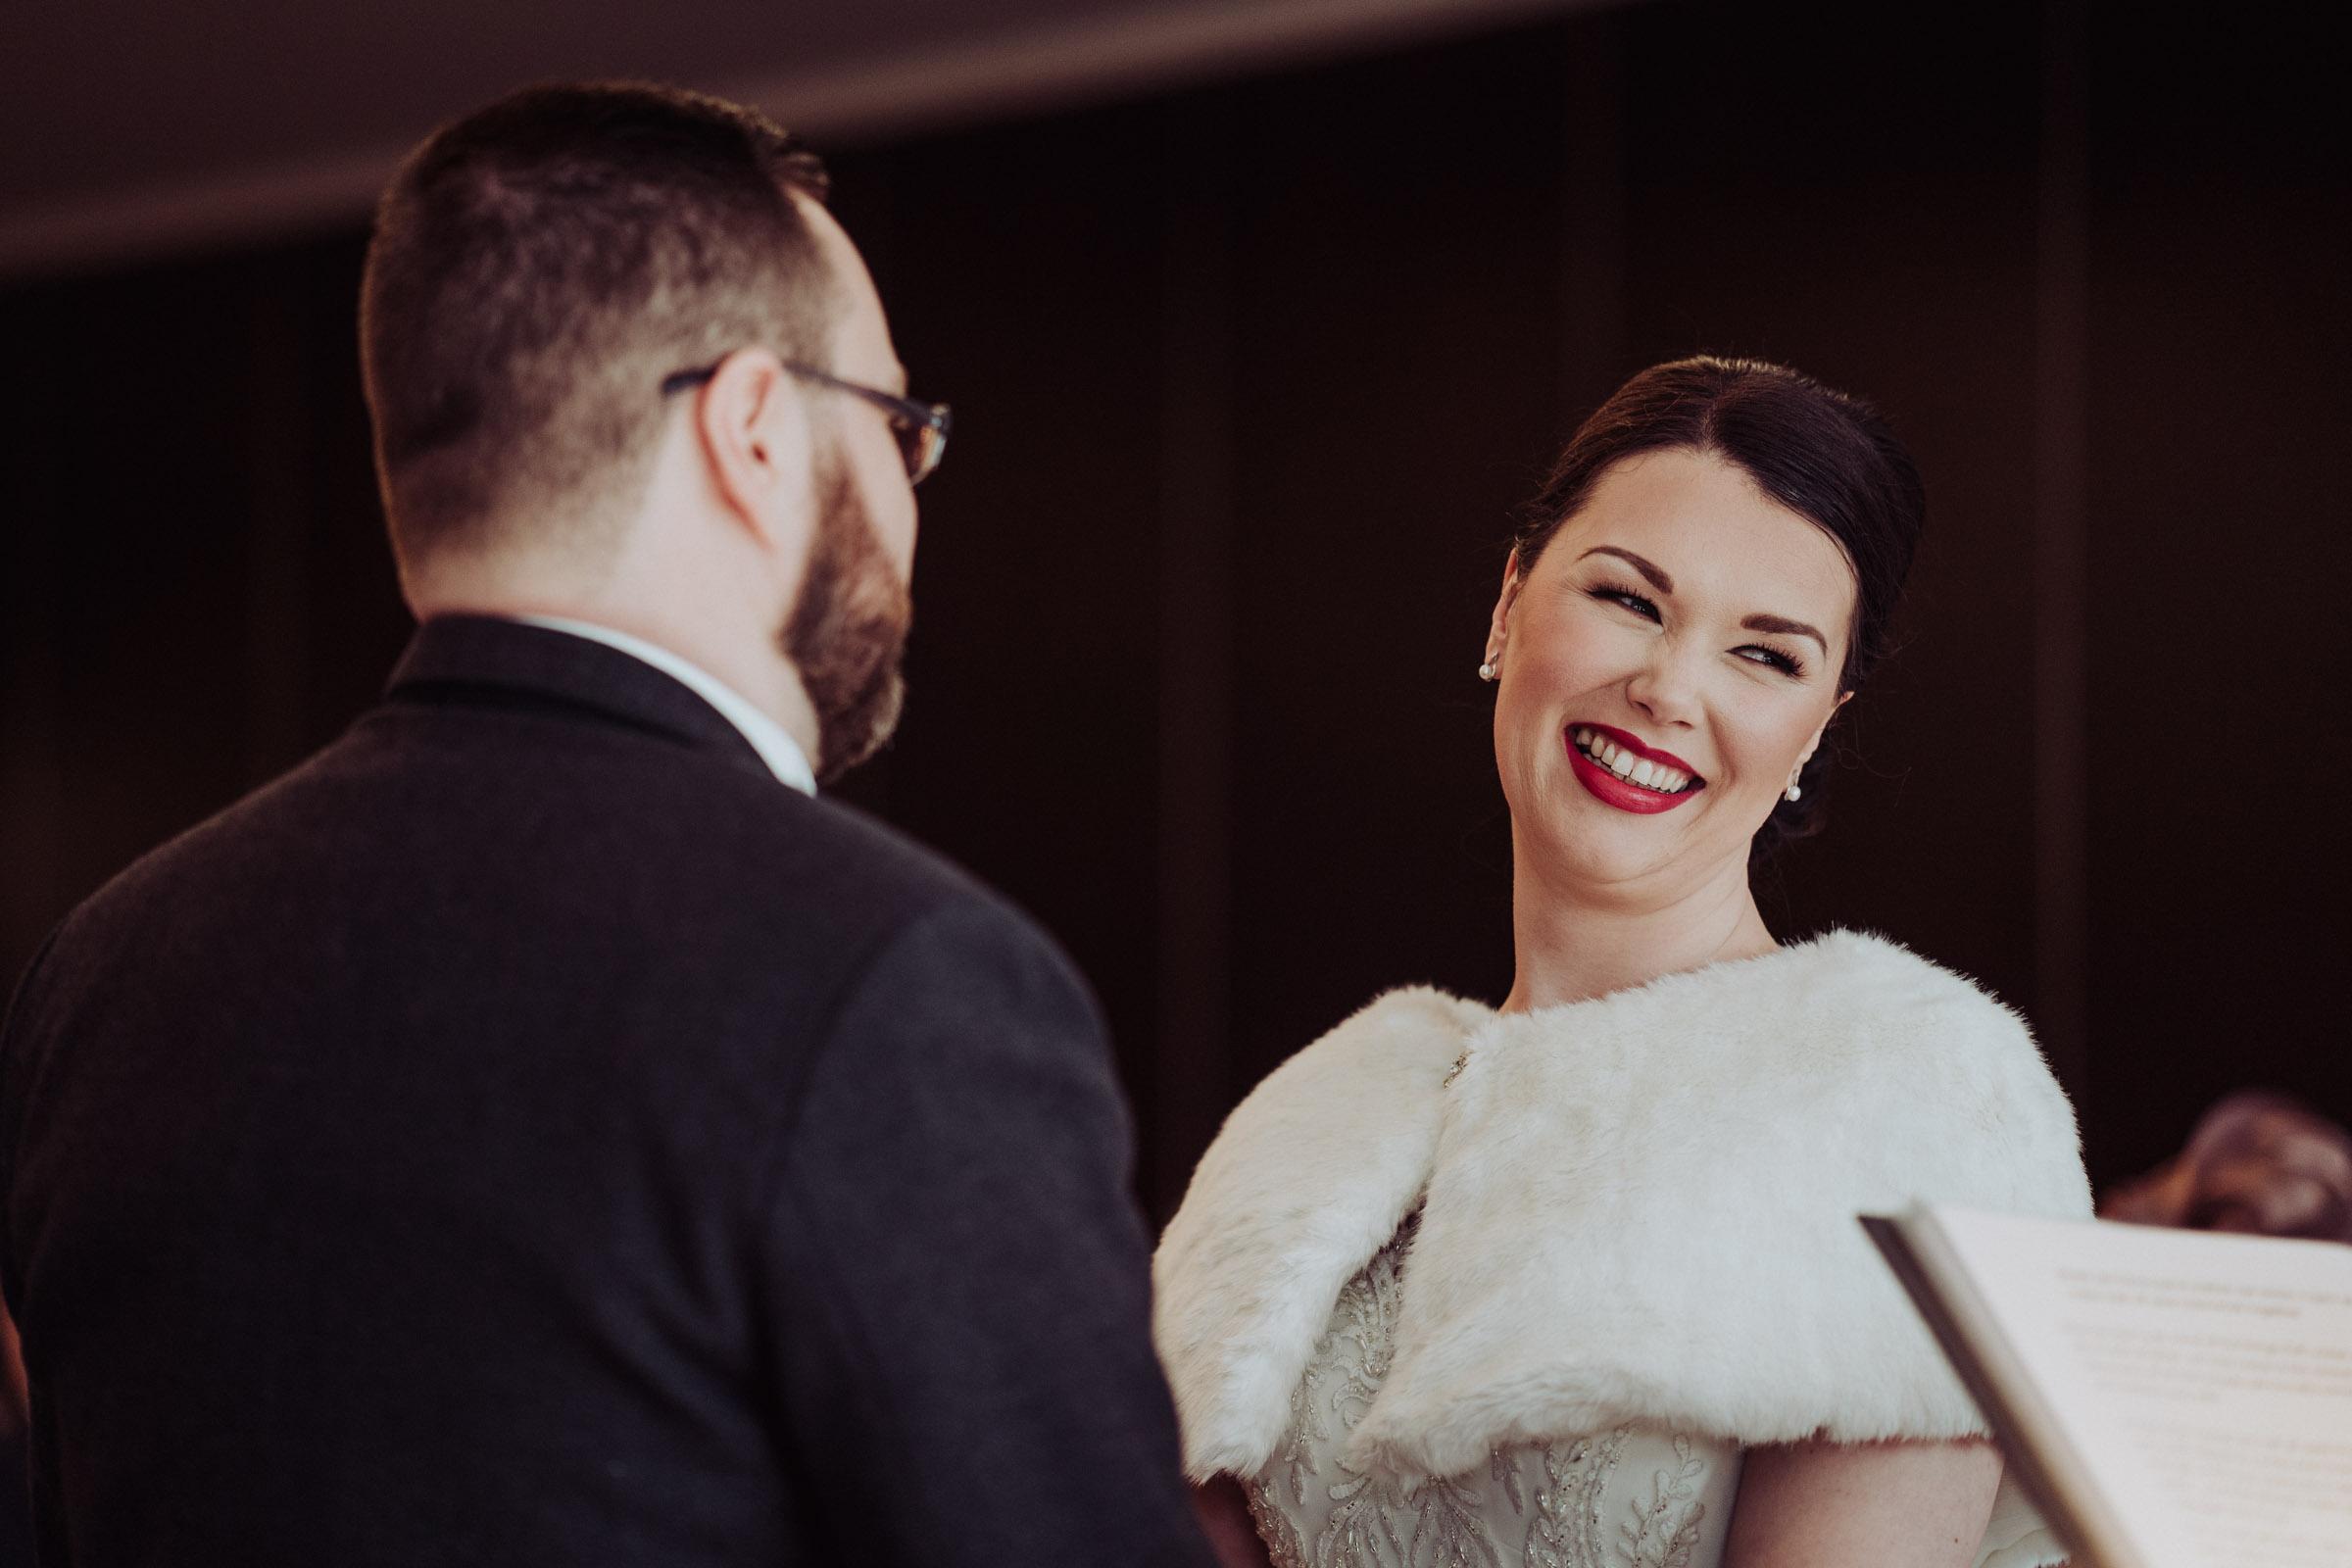 Radstone-Wedding-Dearly-Photography-Scotland (23 of 50).jpg